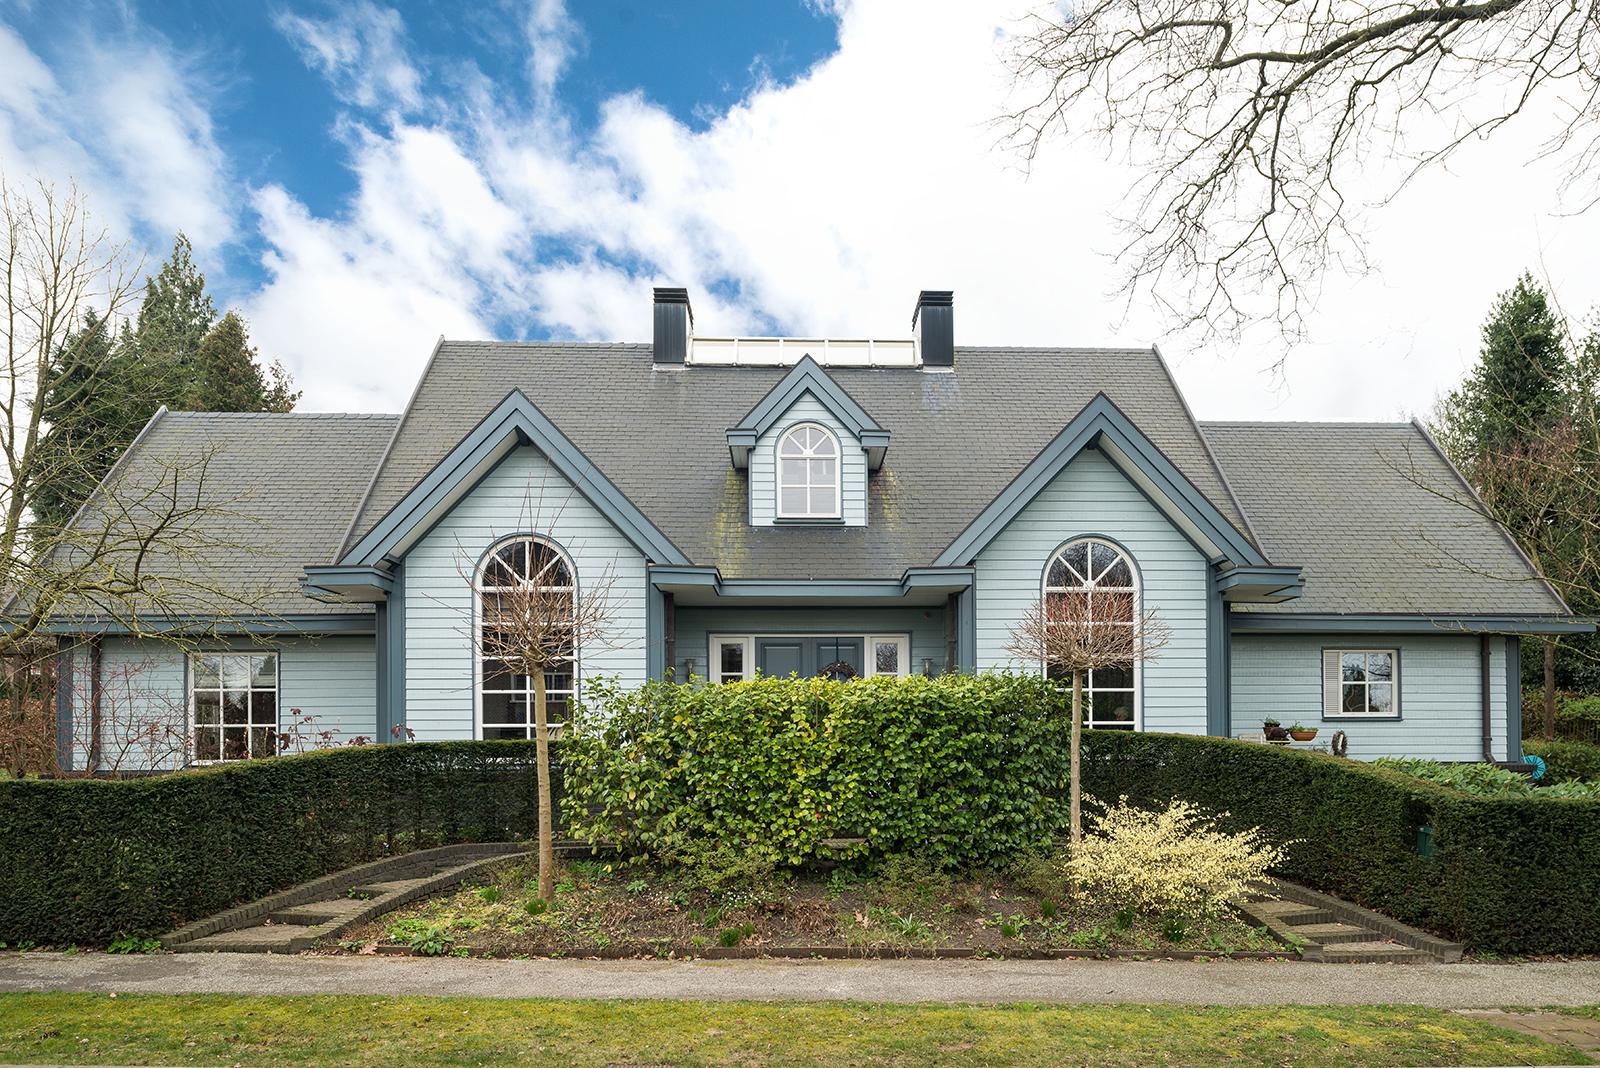 Verwonderend Villa in Amerikaanse stijl - Finnlogs houtbouw bv BE-99